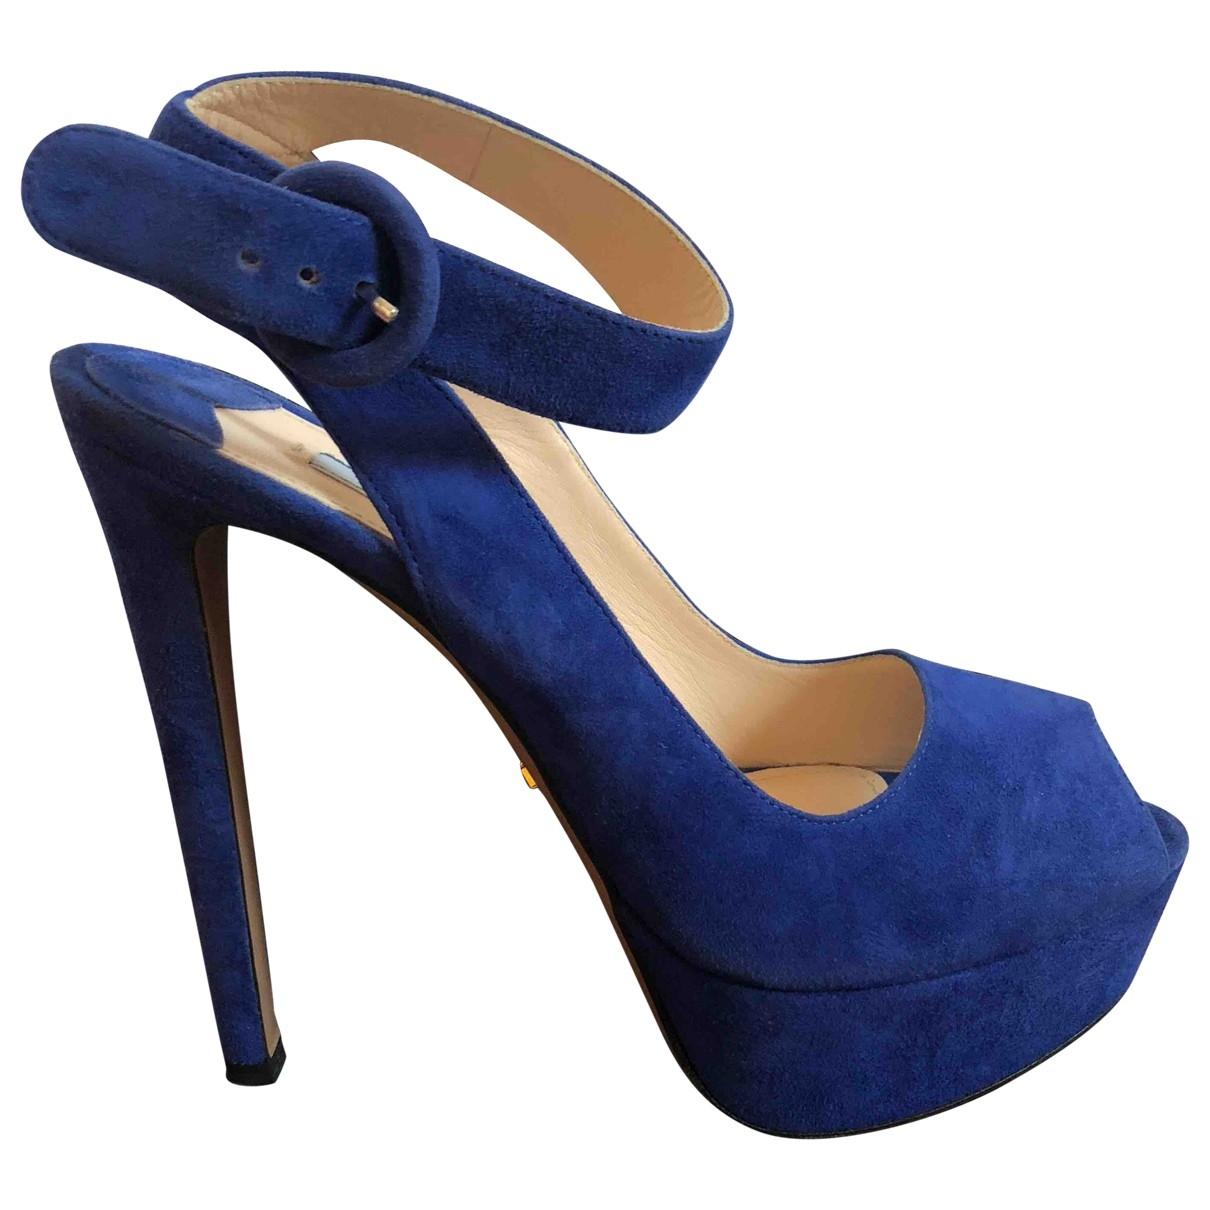 Prada \N Blue Suede Sandals for Women 39 EU